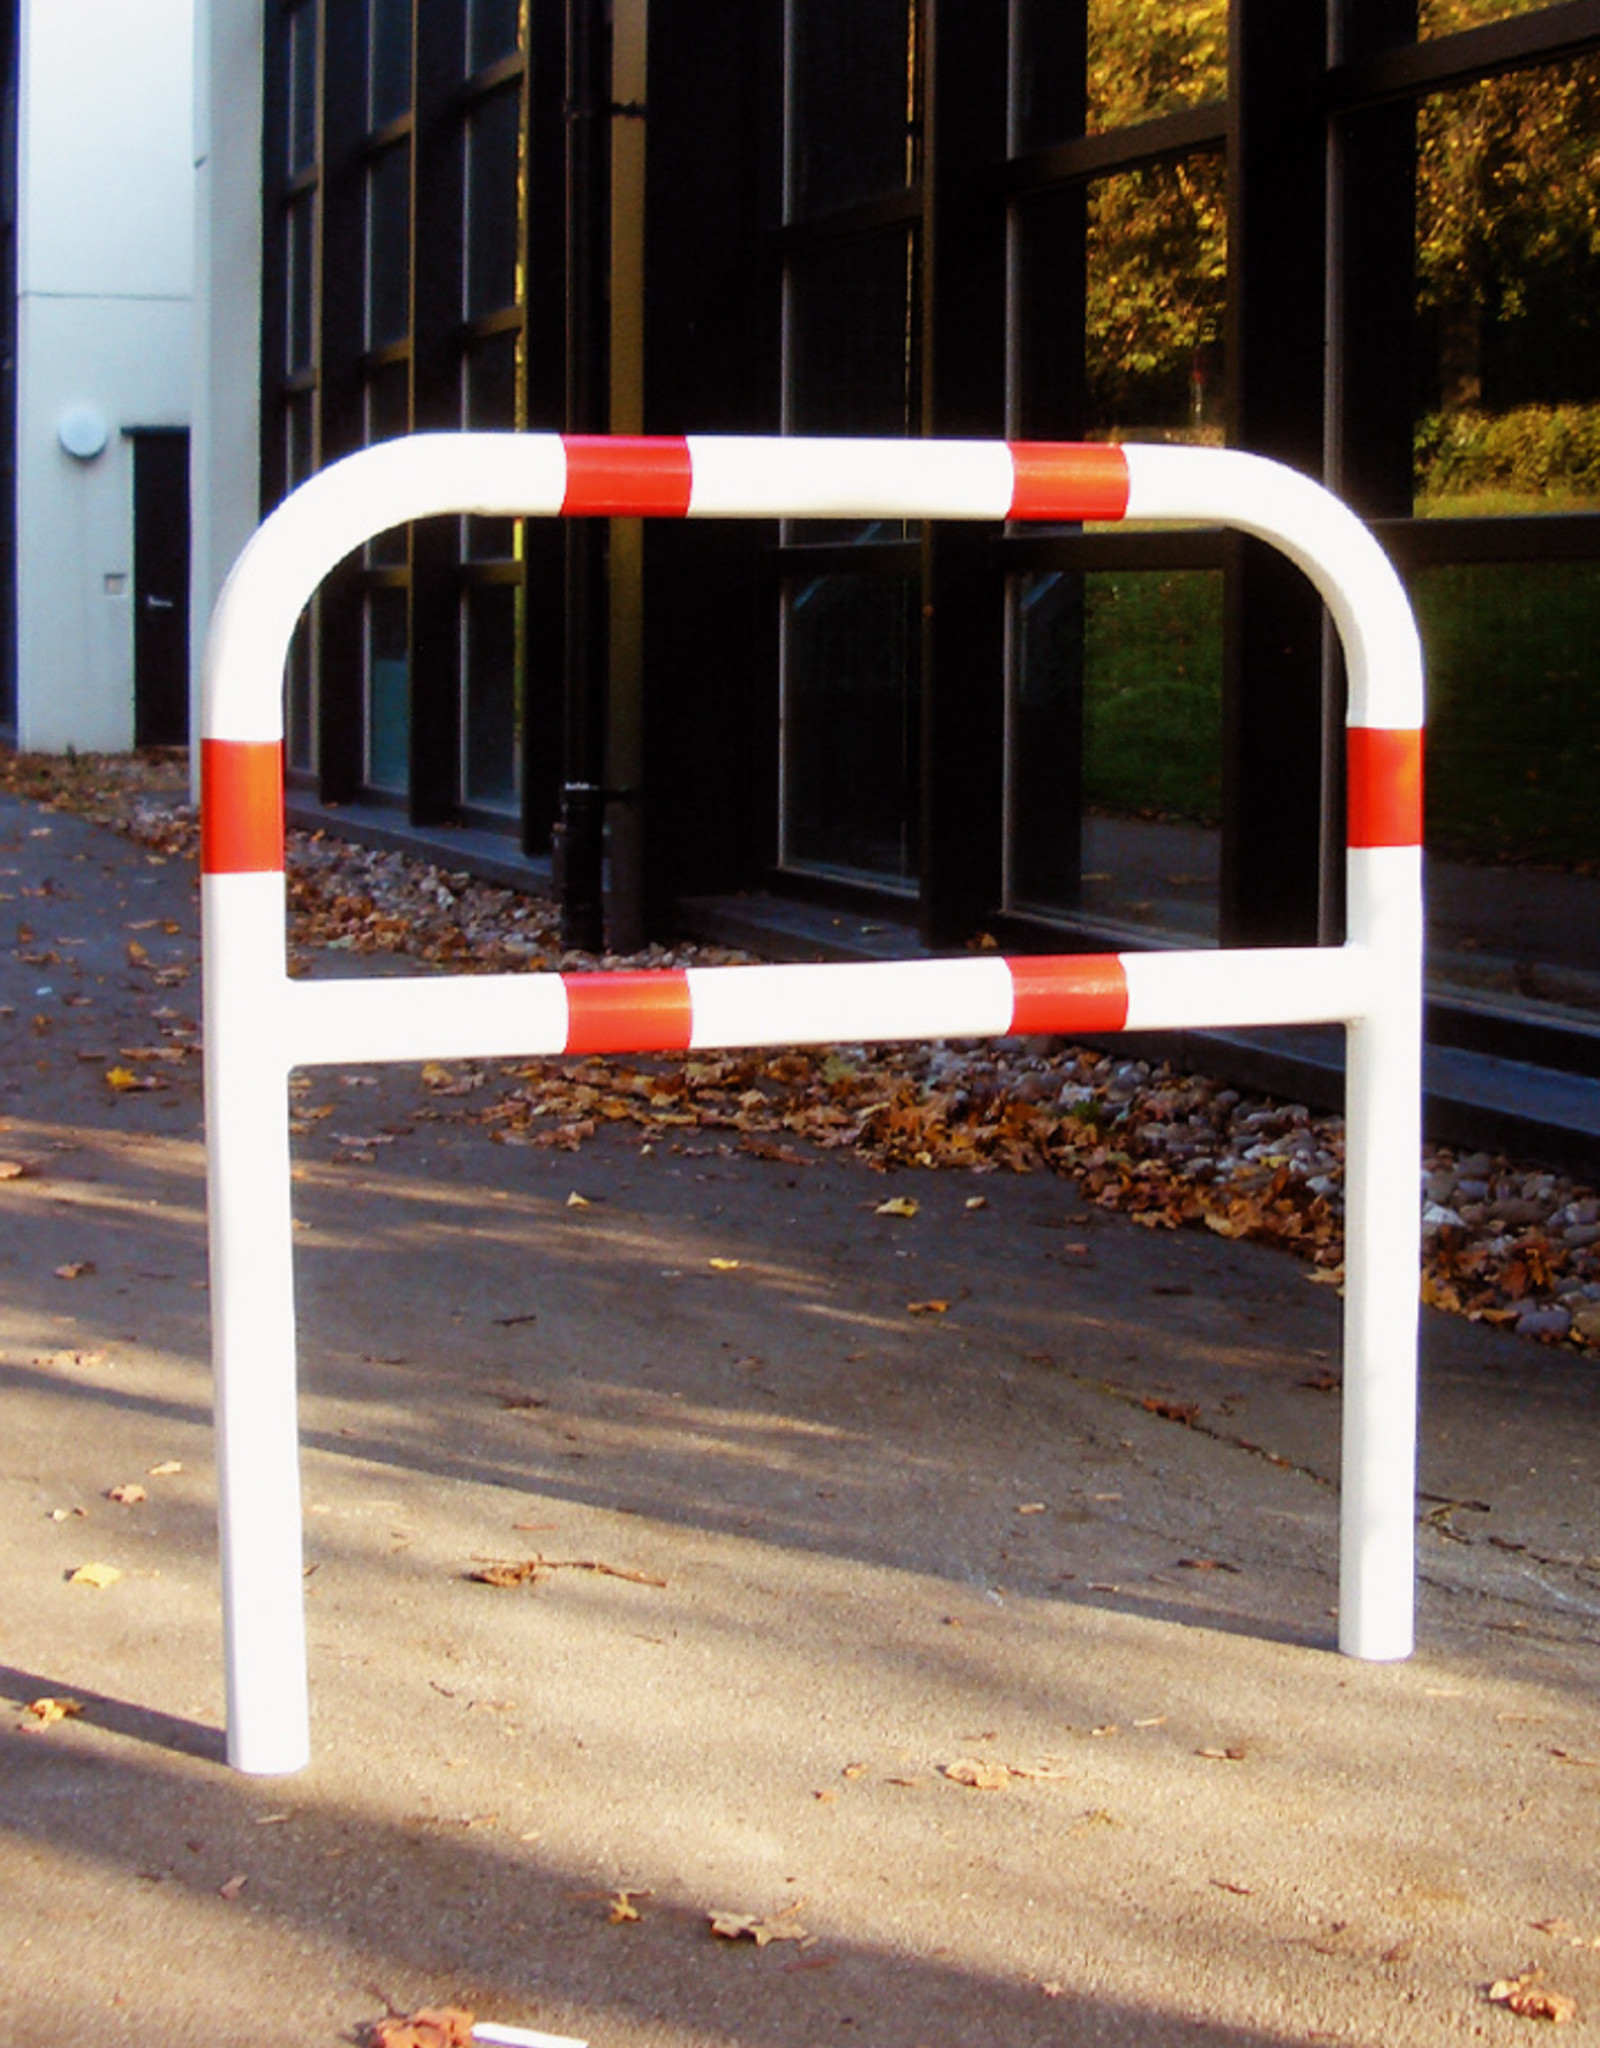 Ri-Traffic | Fietssluis Staal, Rood-Wit, 50 cm x 140 cm